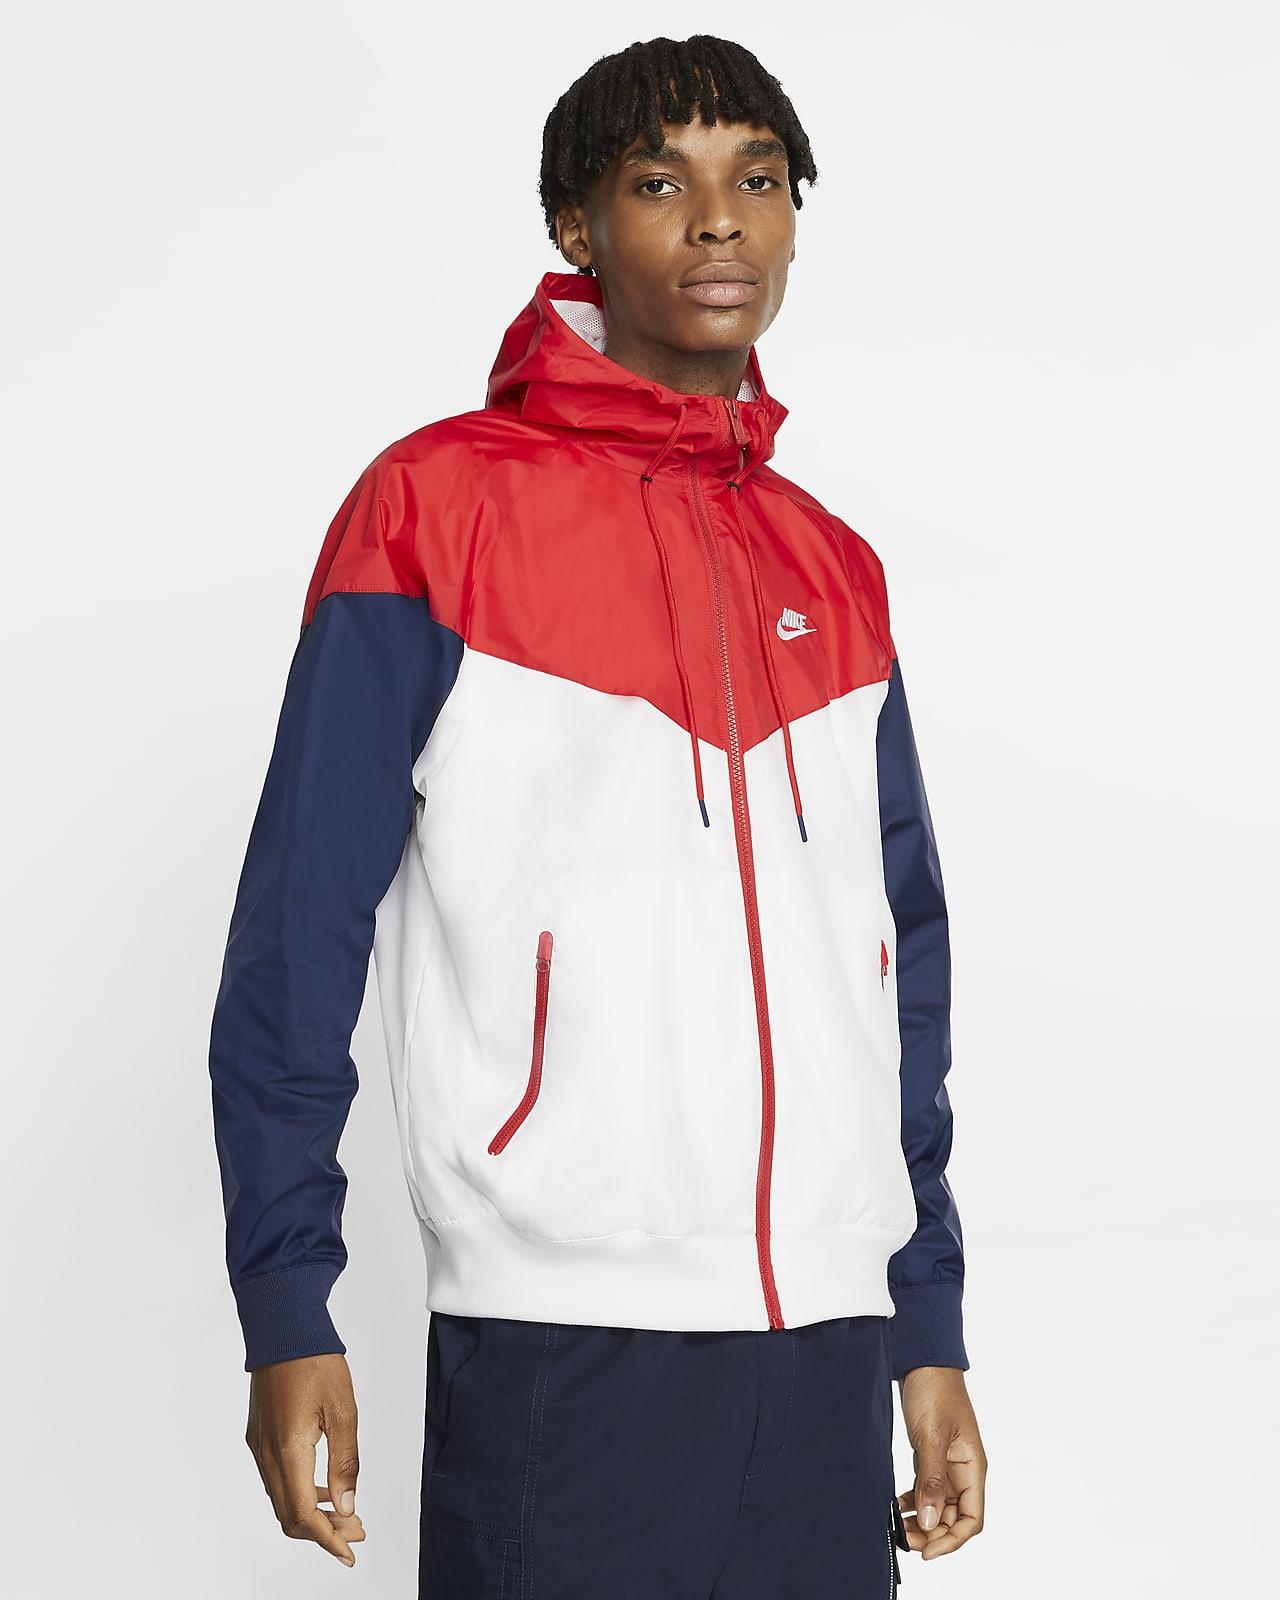 Corta-vento com capuz Nike Sportswear Windrunner